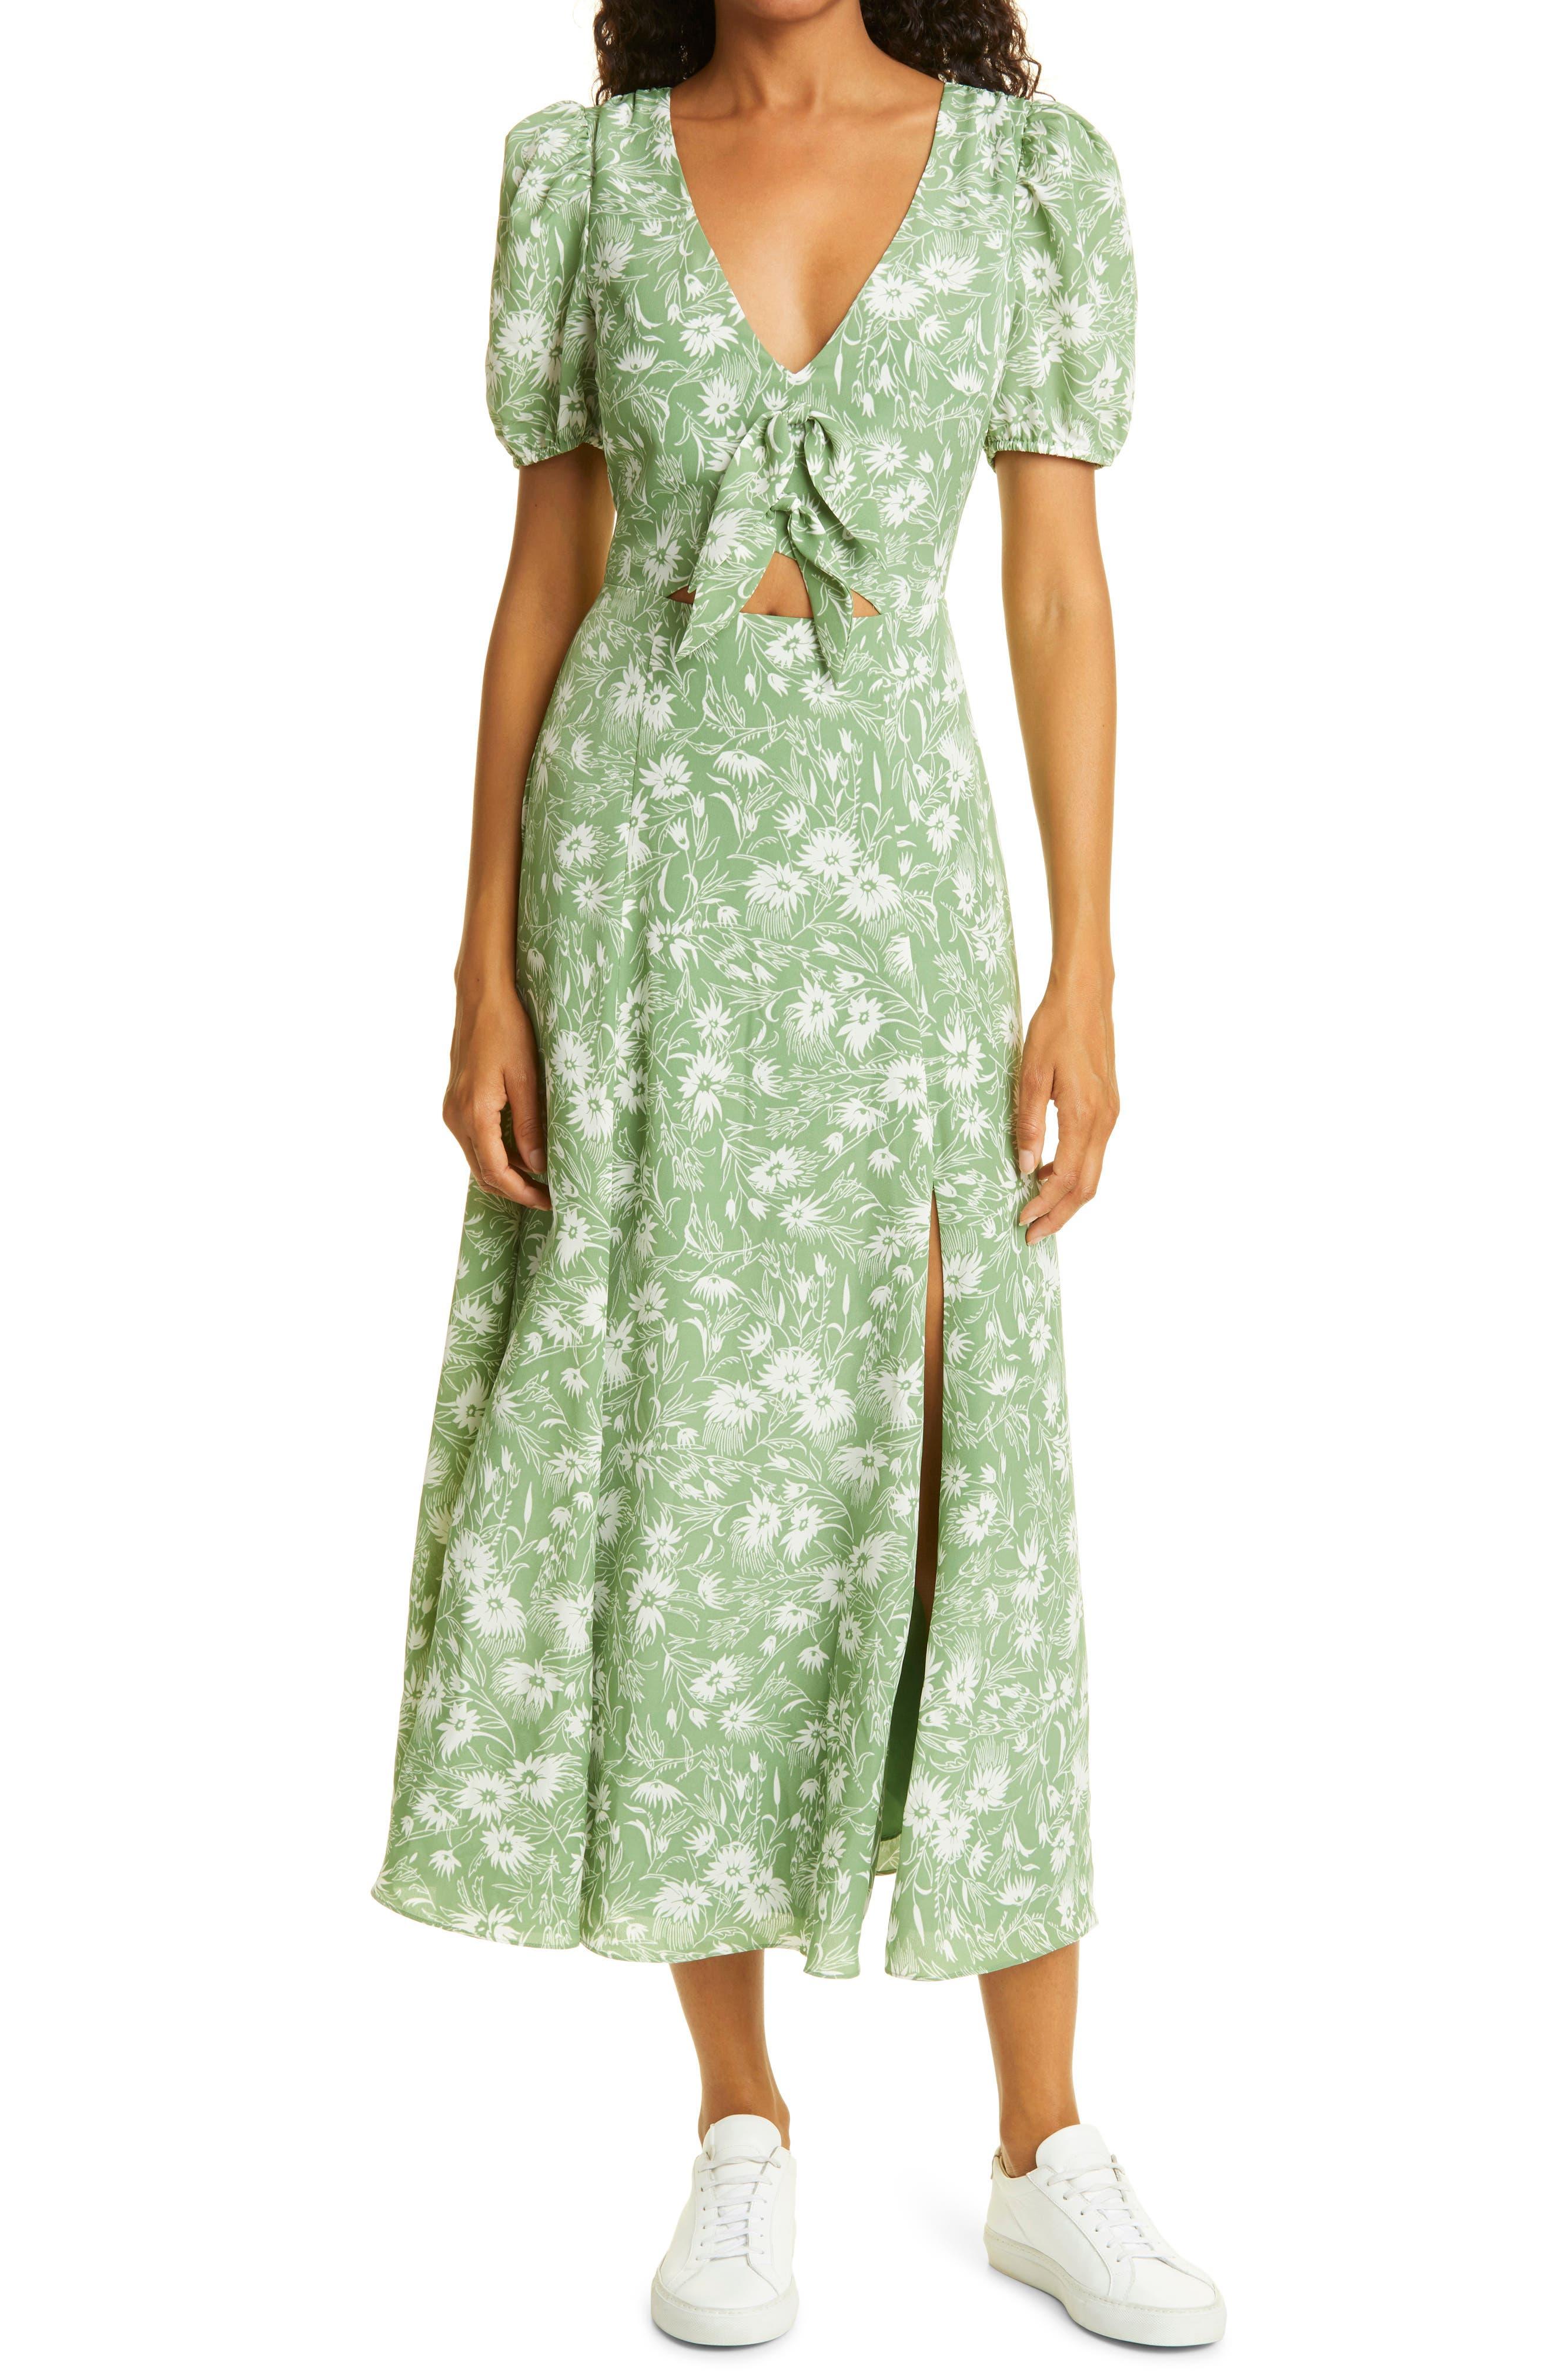 Alisa Floral Dress